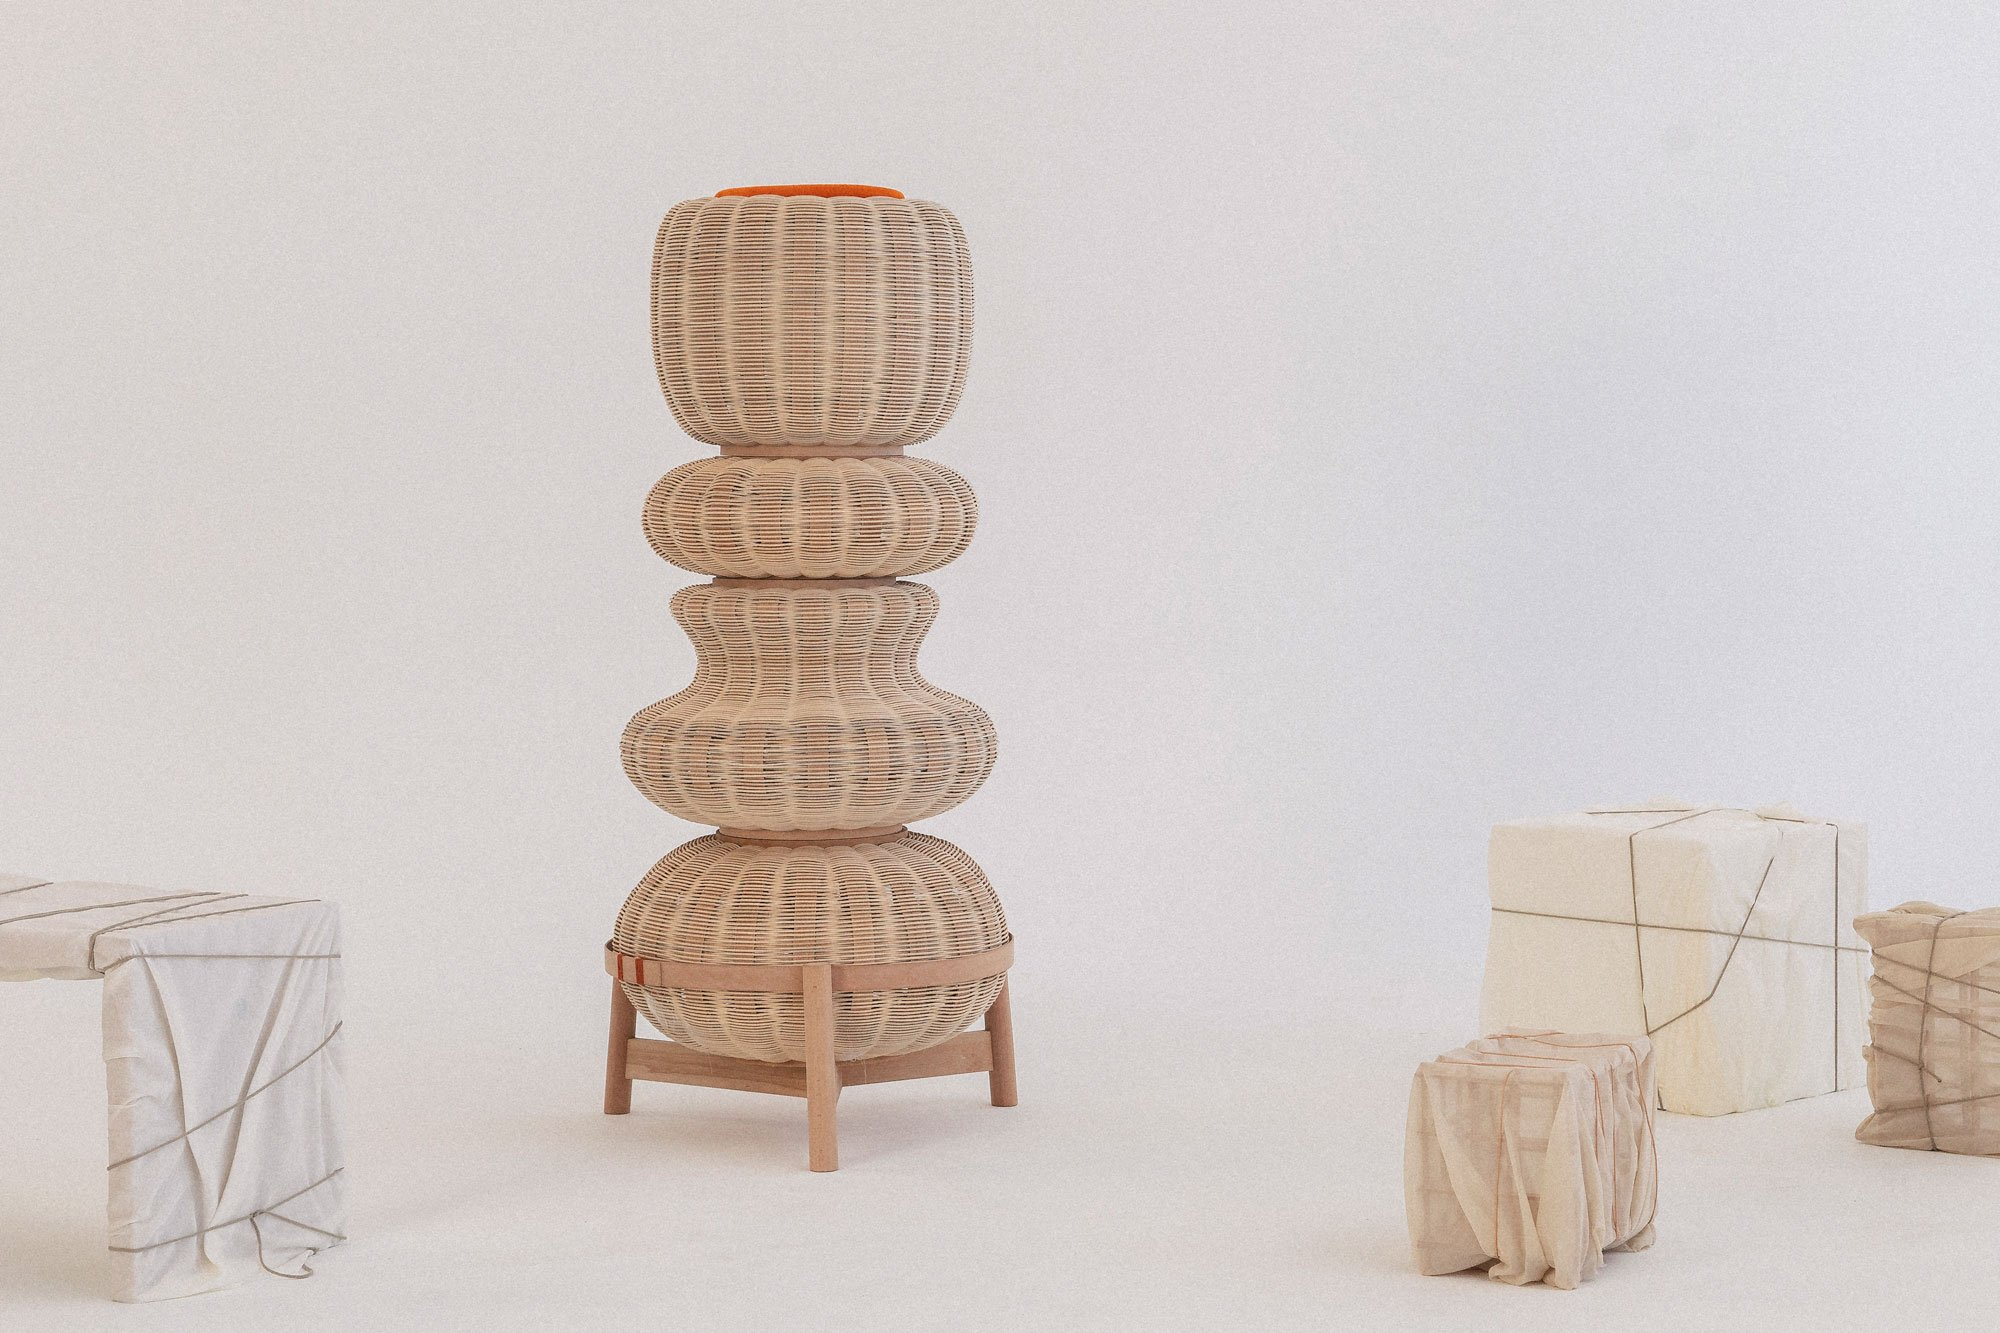 Ukurant Objects, 3daysofdesign 2020, jeunes designers, Sia Hurtigkarl Degel & Pia Angela Rasmussen